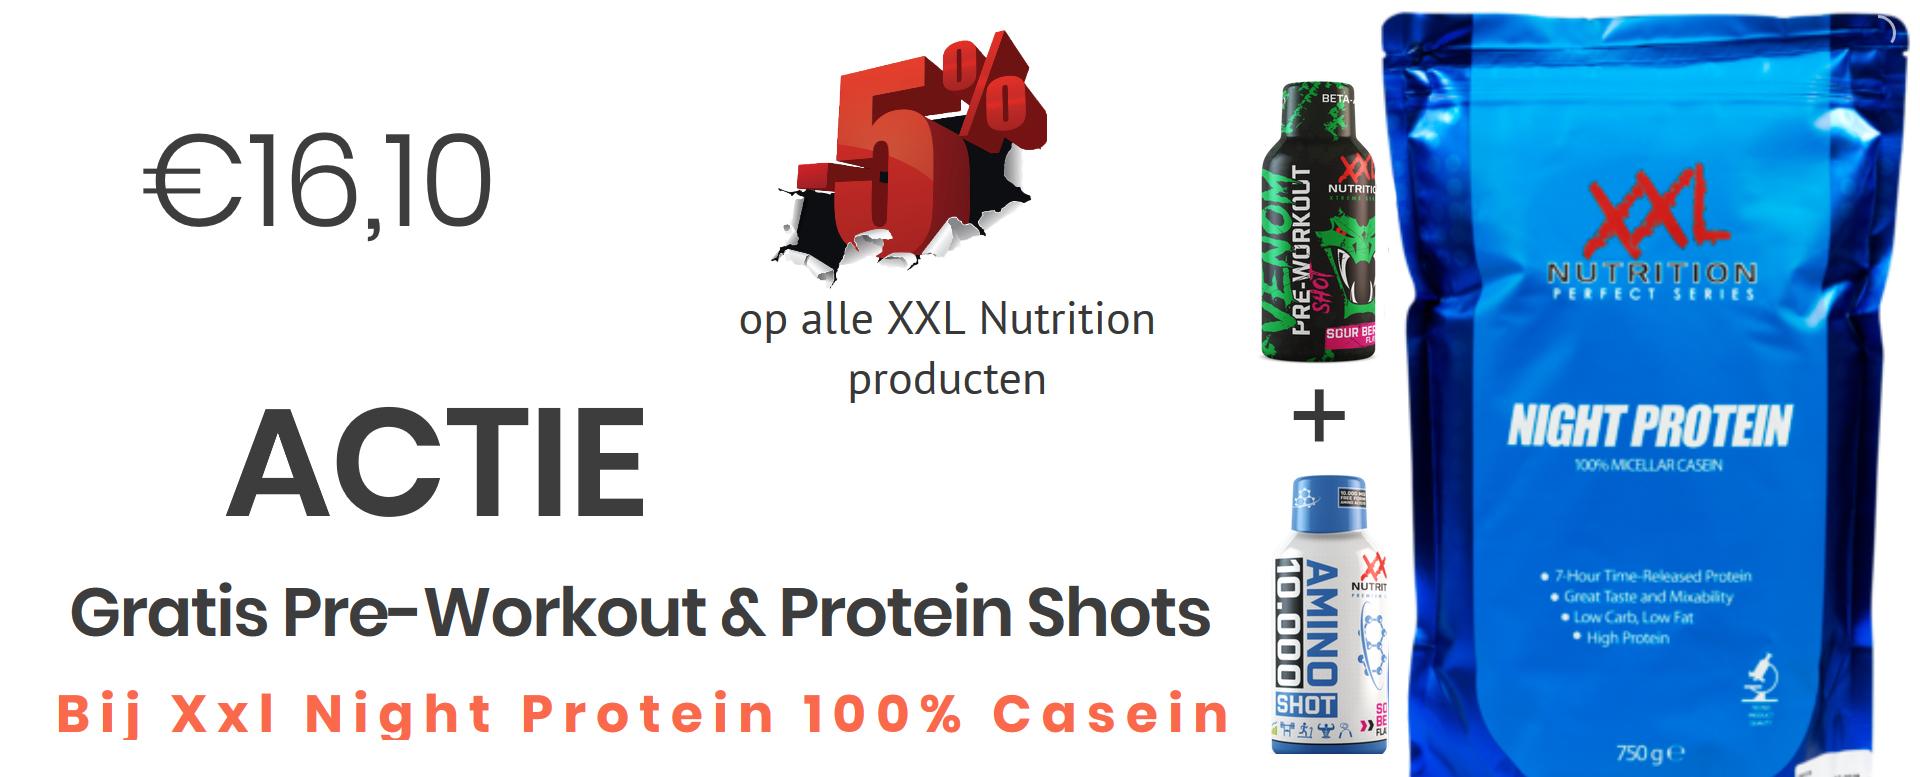 Night Protein actie